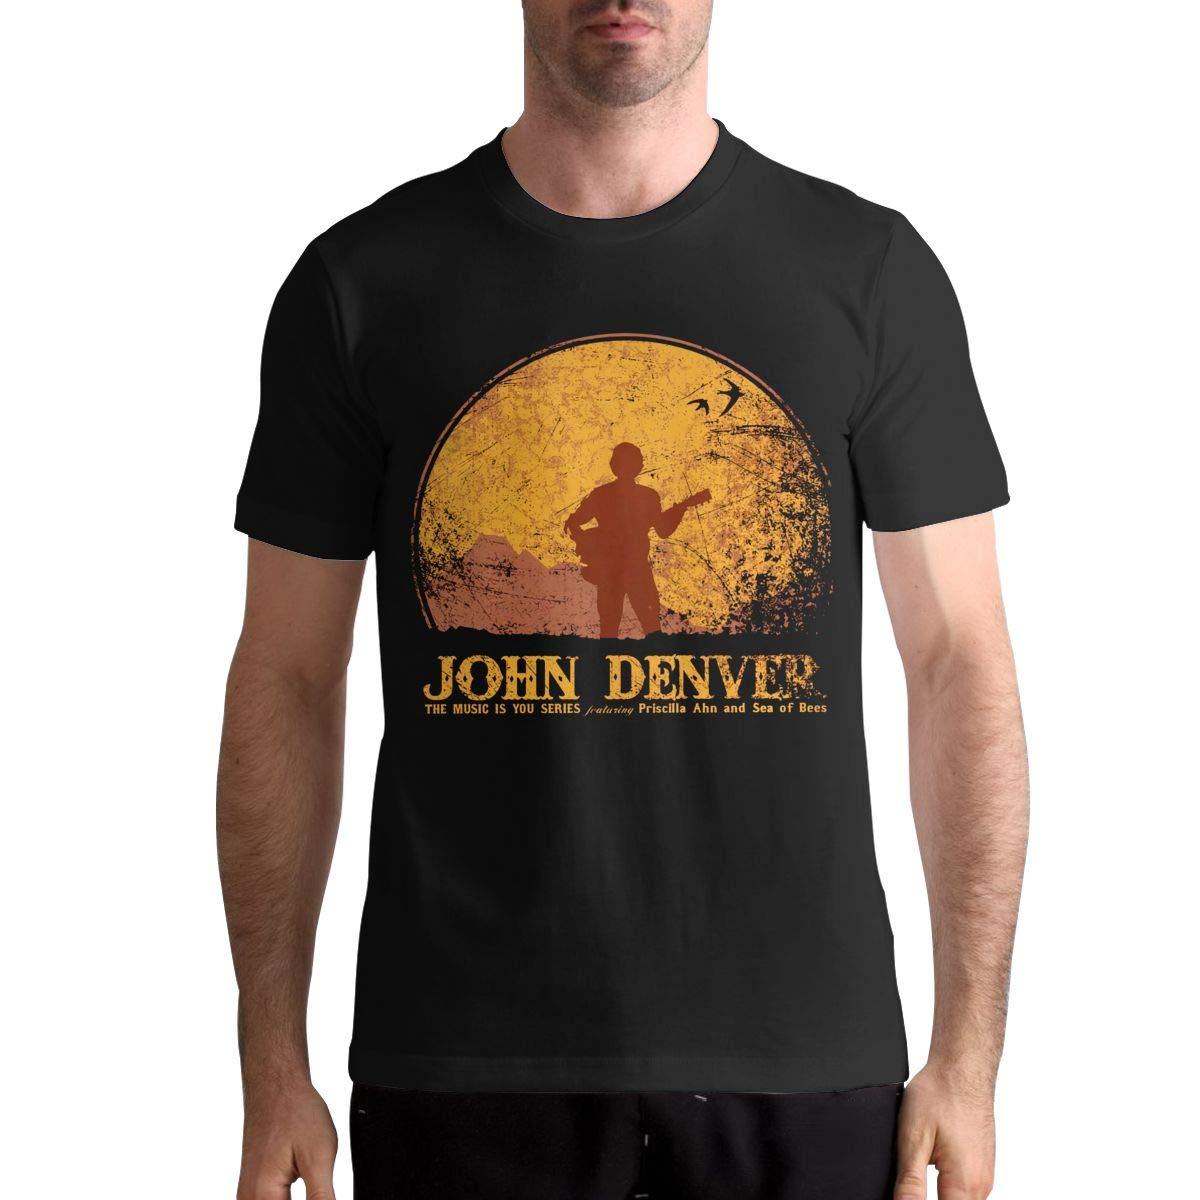 John Denver T Shirt Men's Cotton T Shirt Fashion Round Neck Short Sleeve Tops Tees 100 % Cotton T Shirt For Boy